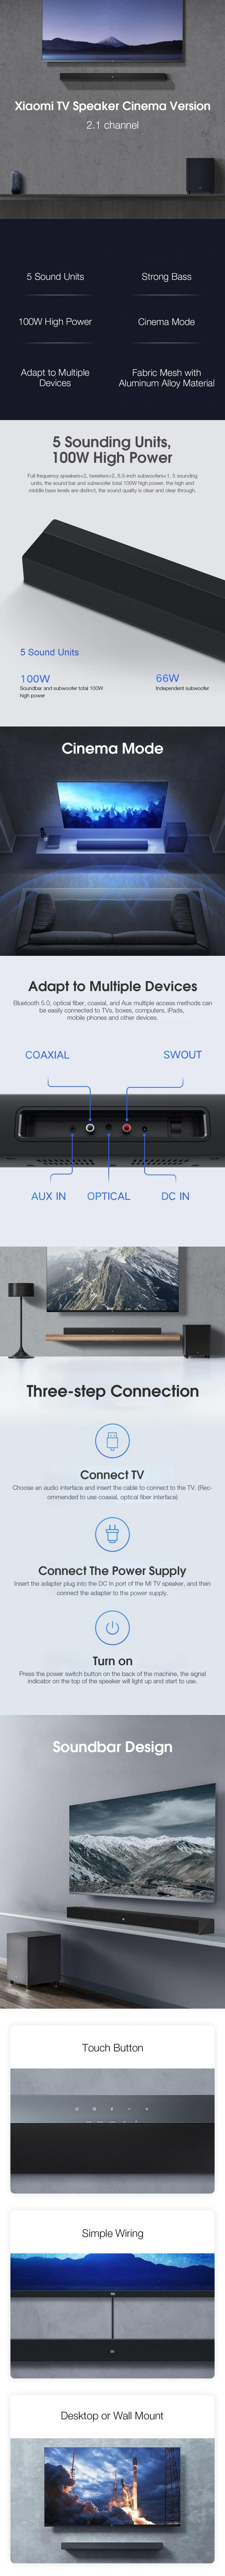 Xiaomi-Mi-Soundbar-2.1-Cinema-Versionfb6a3a59b88b1e7a.jpg